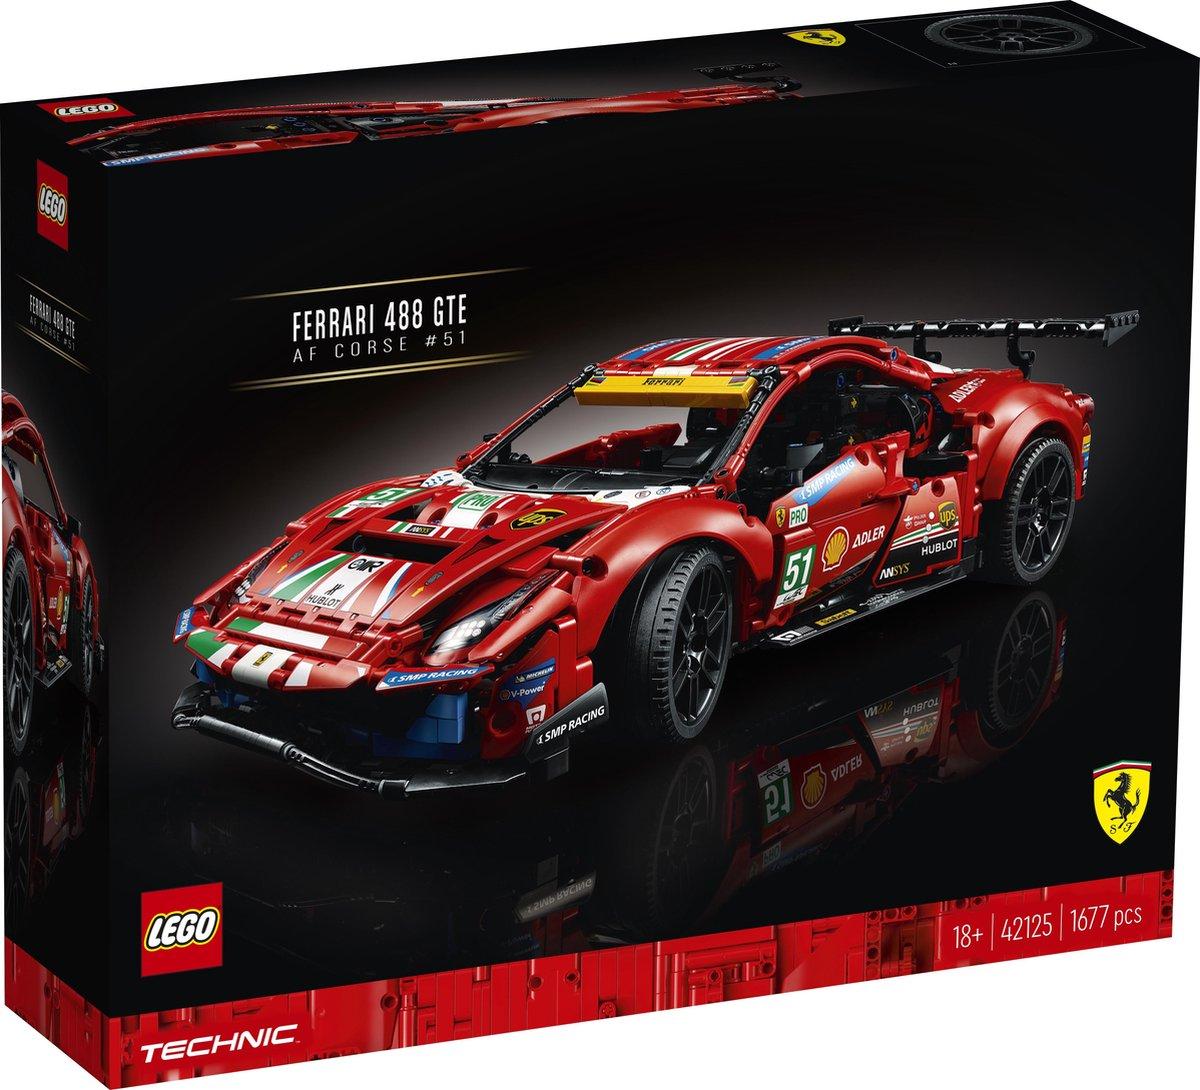 LEGO Technic Ferrari 488 GTE AF Corse #51 – 42125